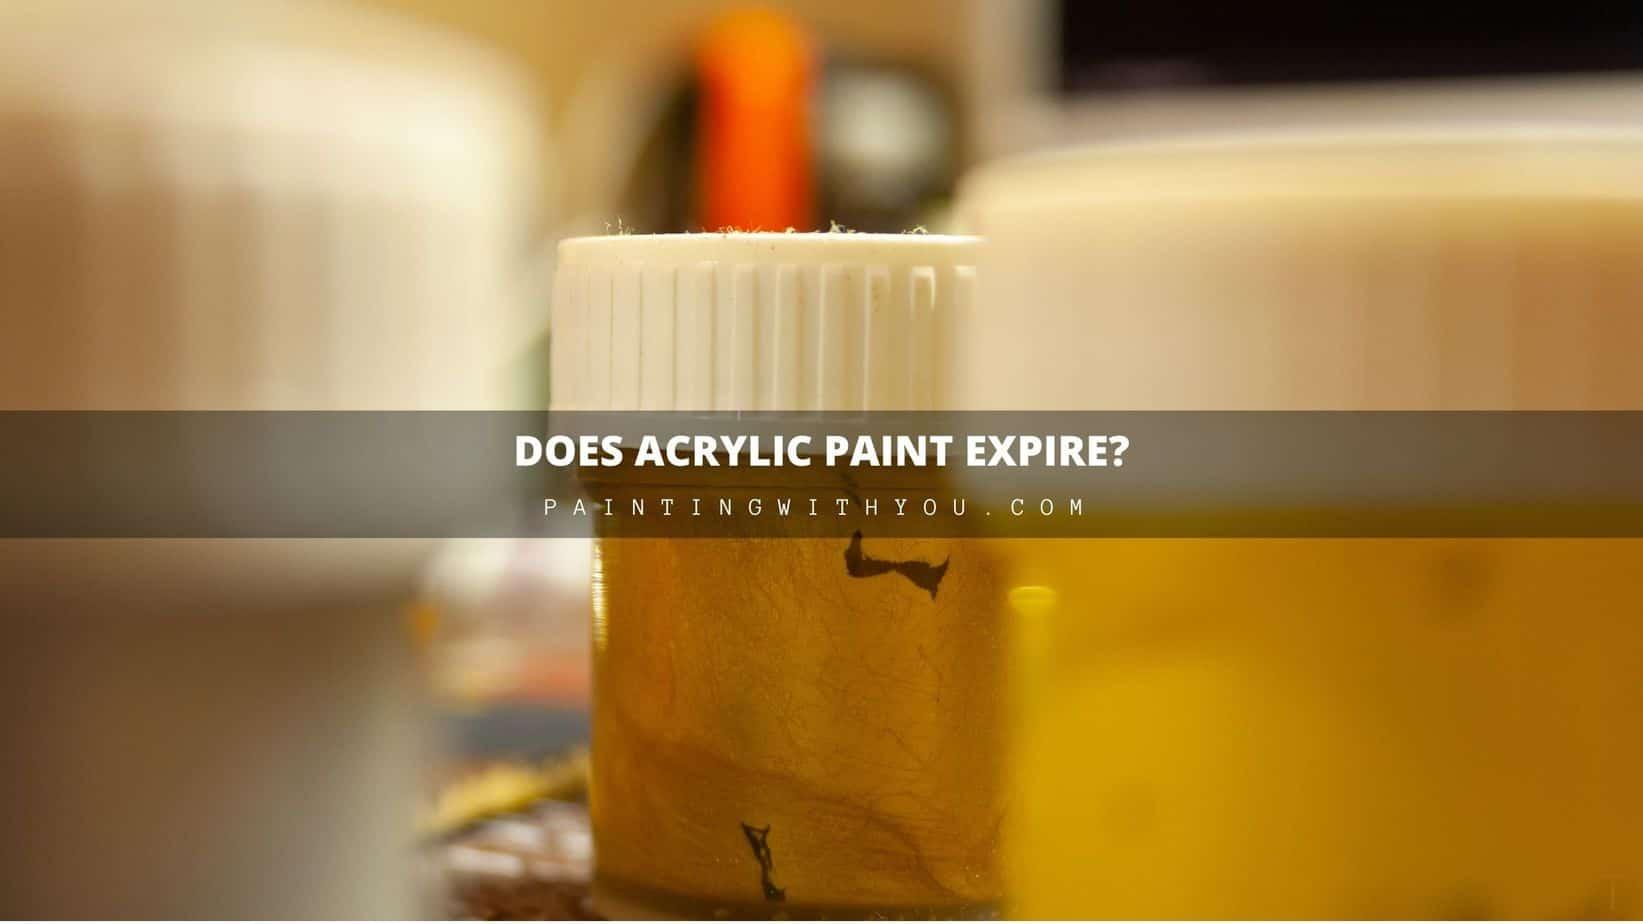 Does acrylic paint expire